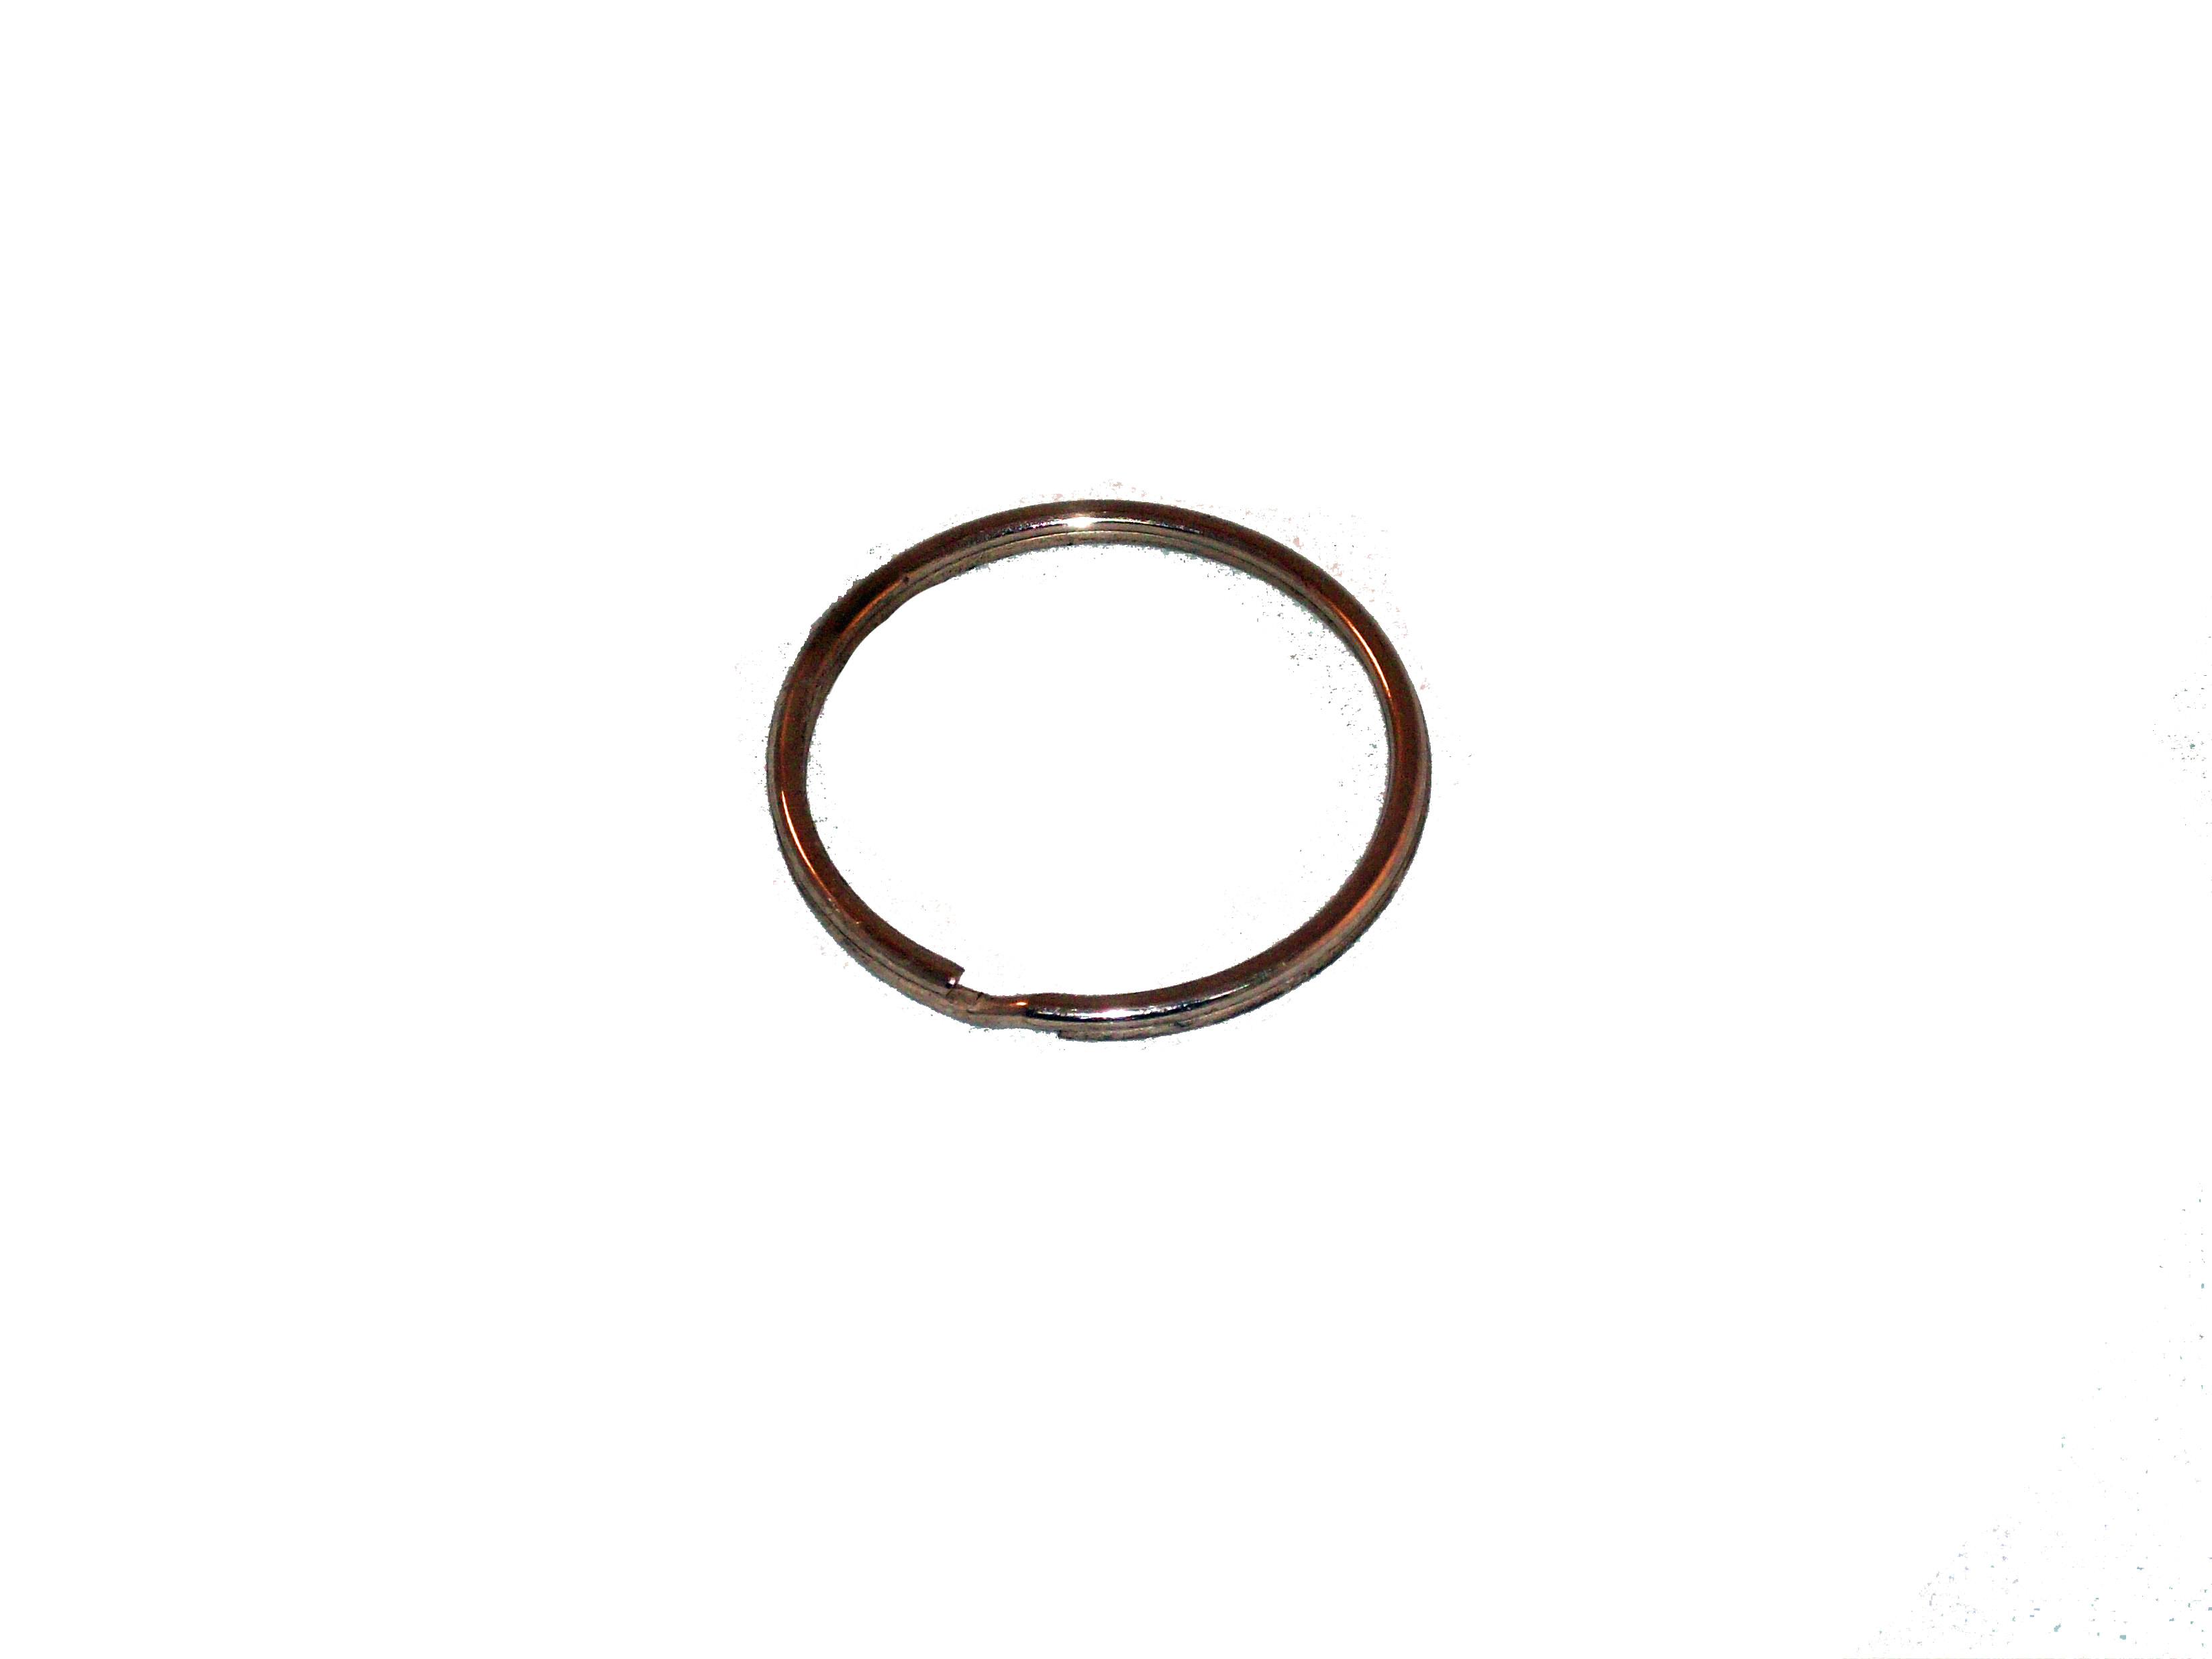 Rotary FJ7985-1 - 2 Inch Actuator Pin Handle No.90210